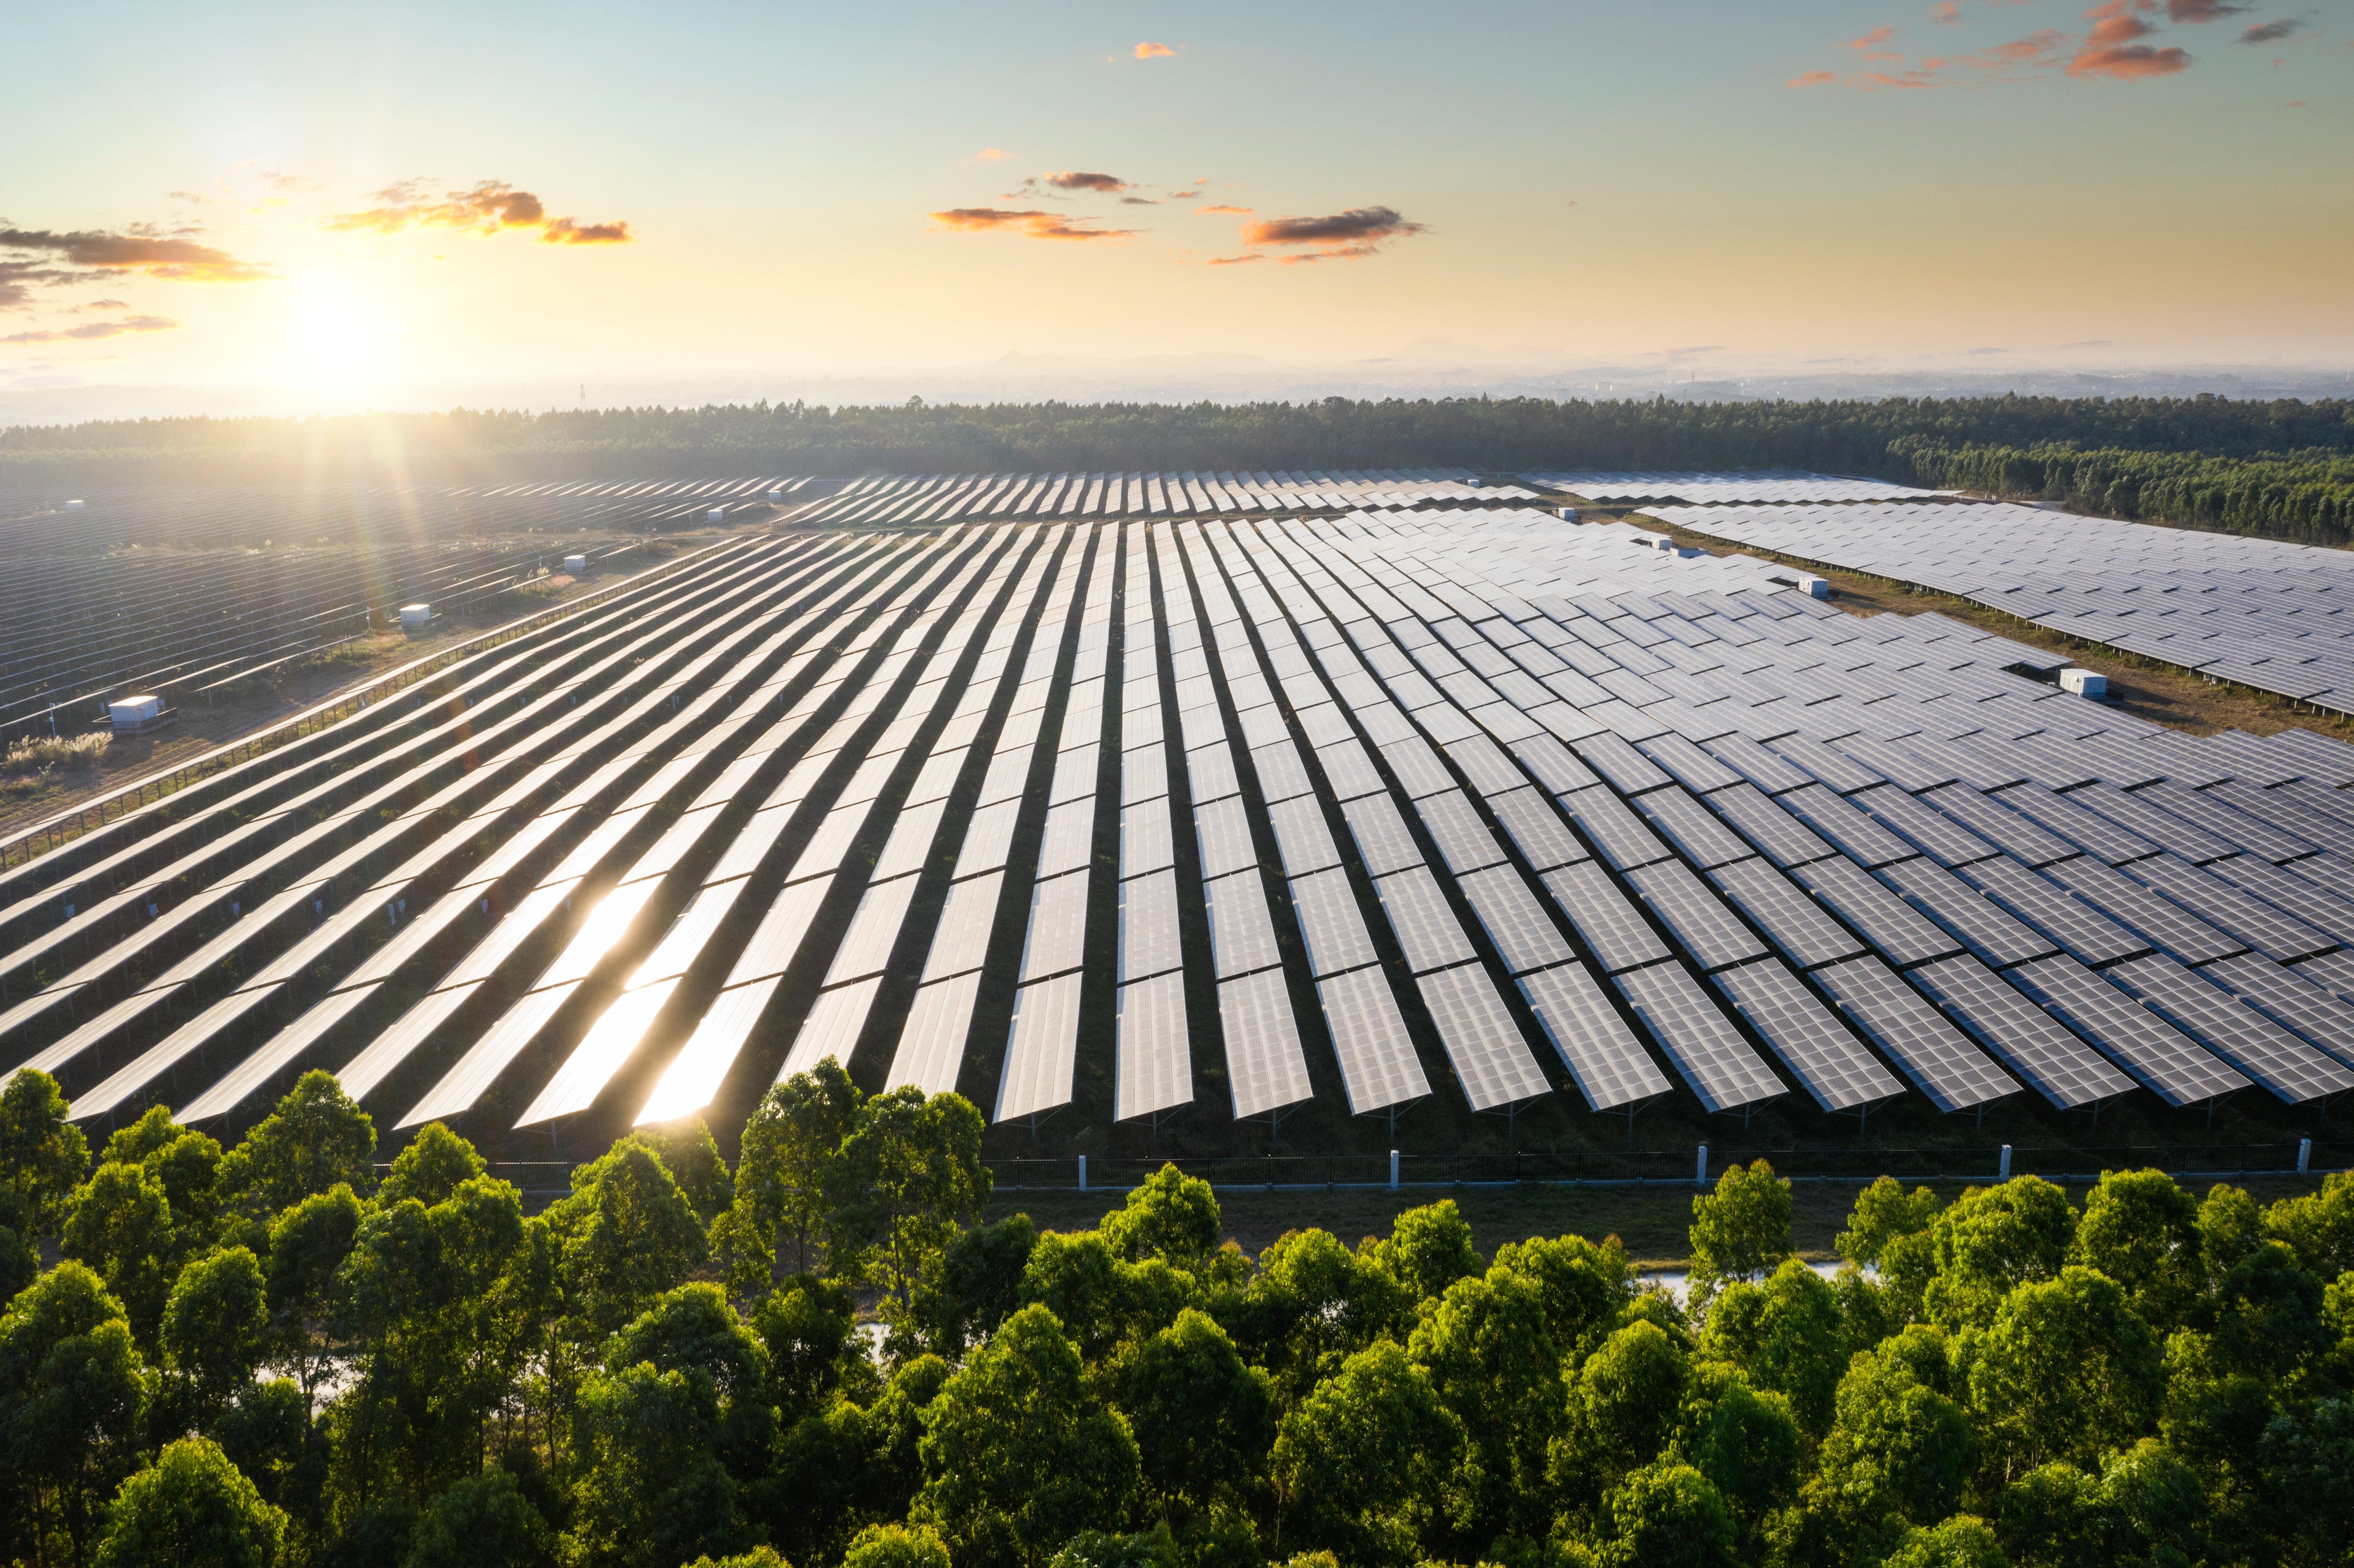 Impianti Fotovoltaici In Vendita Puglia fotovoltaico in italia impianti fotovoltaici fotovoltaico